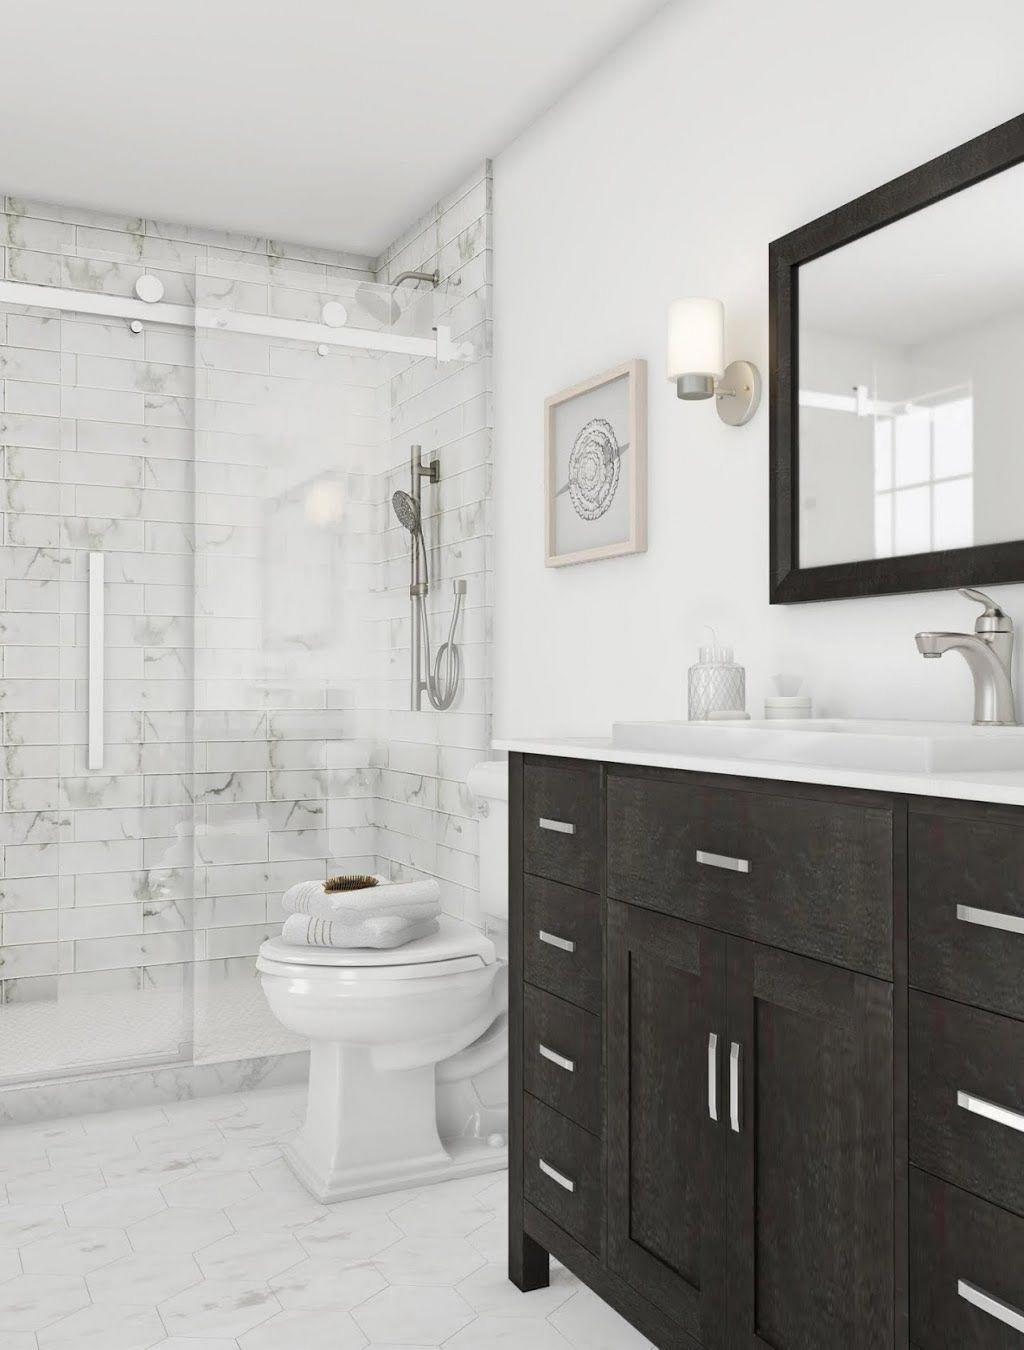 Msi Marmi Blanco White 4 In X 16 In Glazed Ceramic Wall Tile 11 Sq Ft Case Nhdmarbla4x16 Th In 2020 Bathroom Trends Bathrooms Remodel Bathroom Design Small